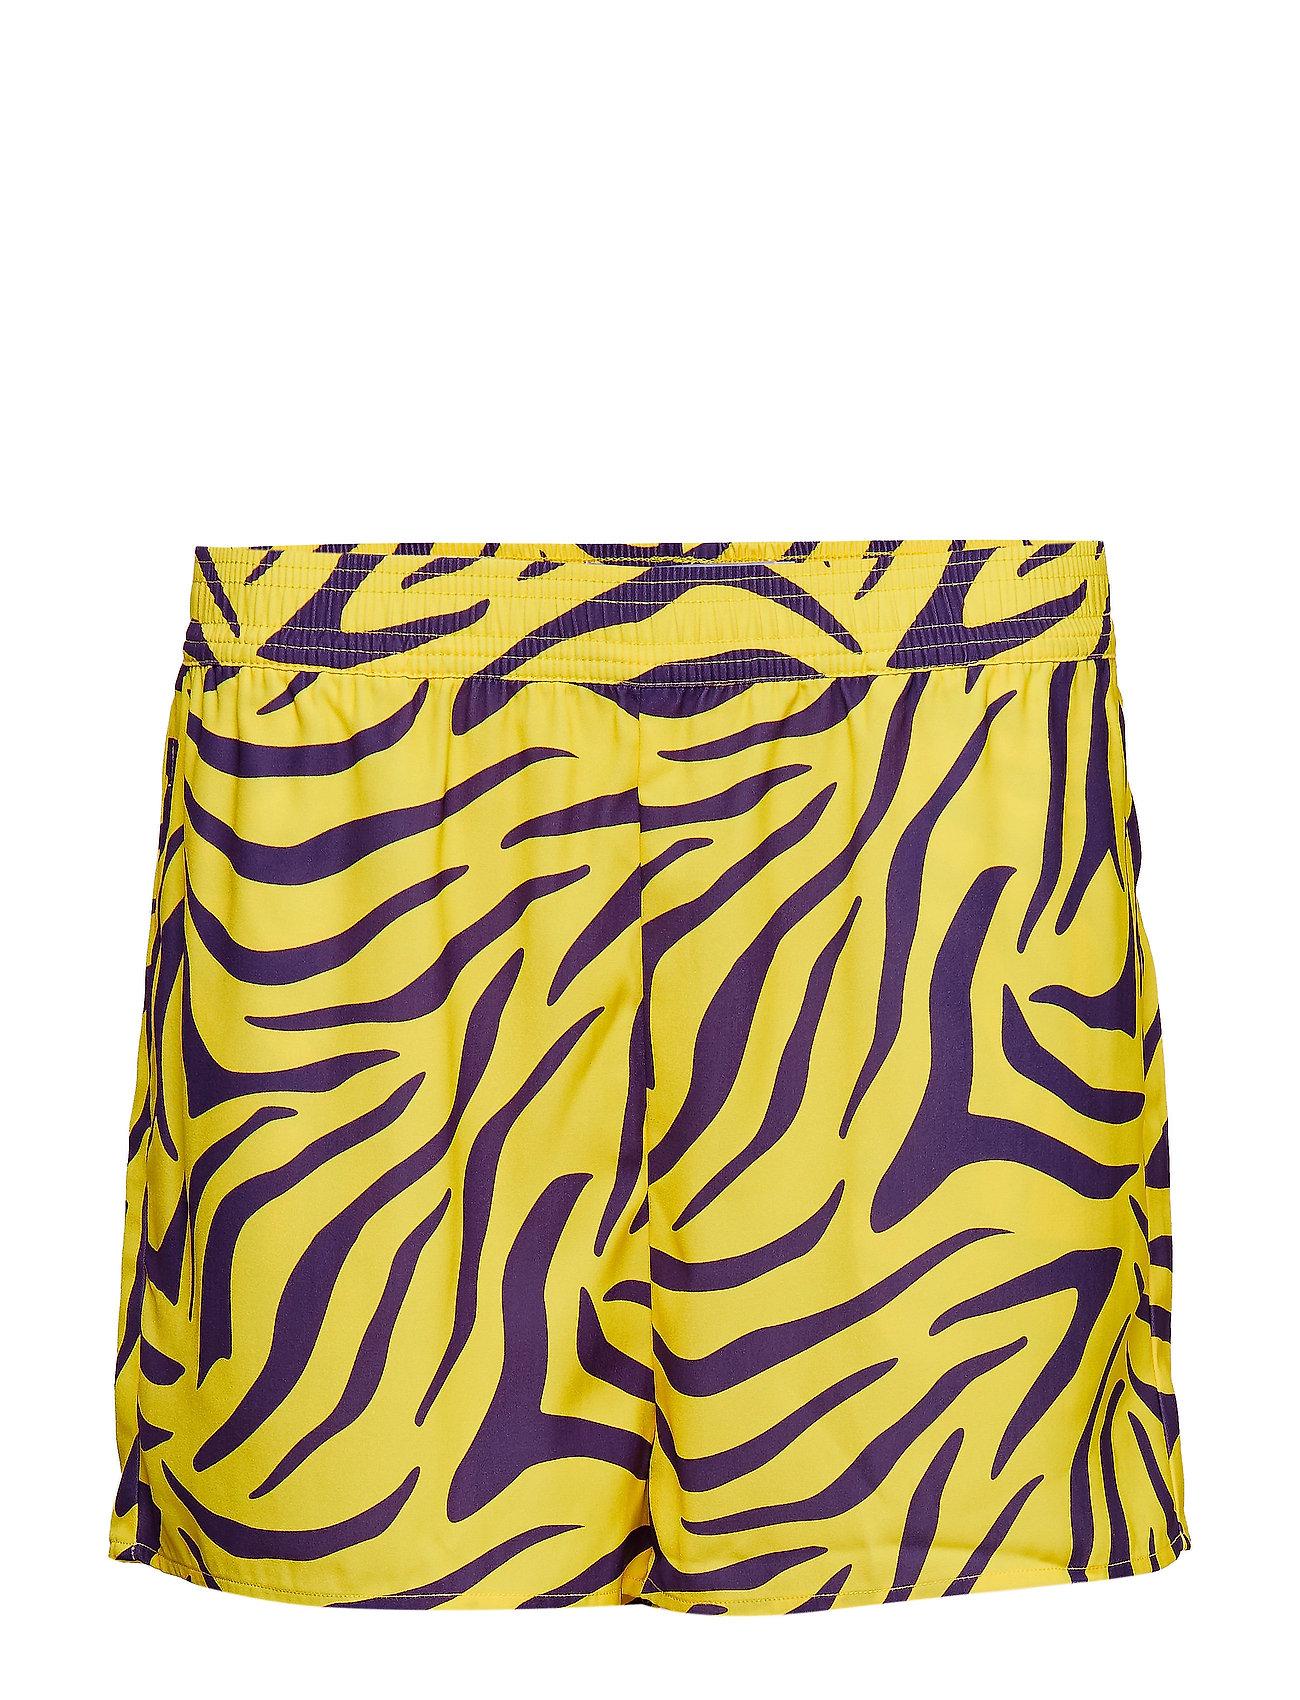 Ivyrevel High Waist Shorts - PURPLE/YELLOW